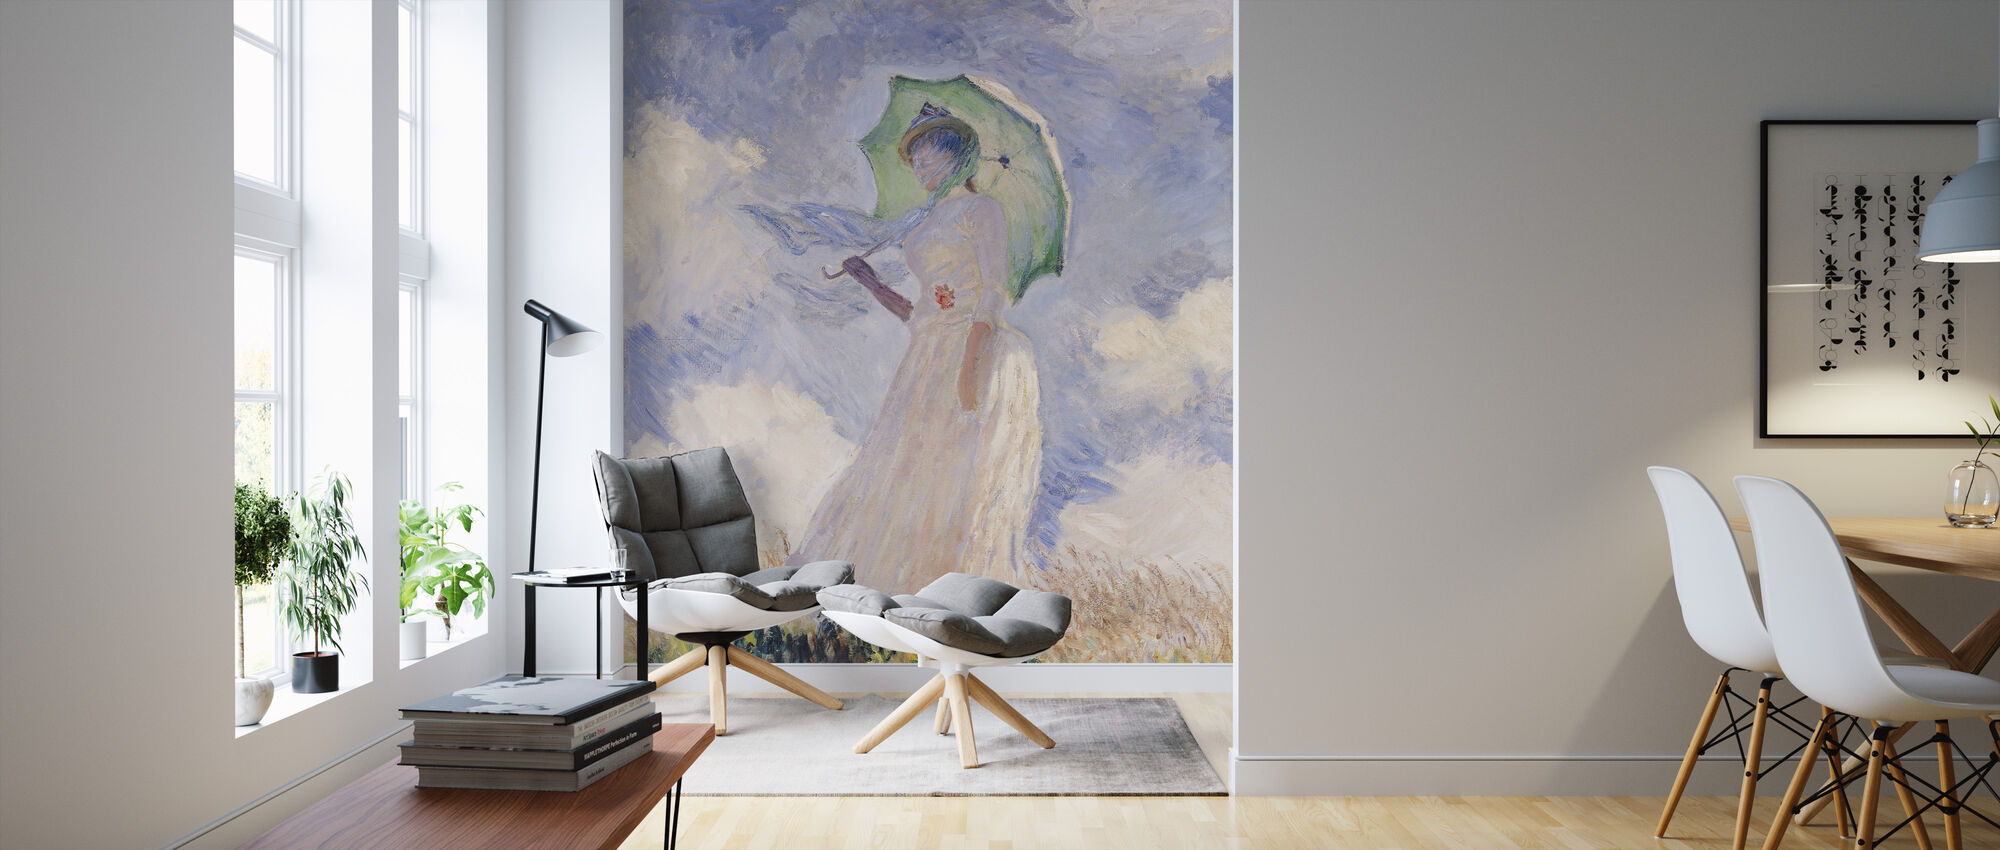 Woman with Parasol, Claude Monet - Wallpaper - Living Room